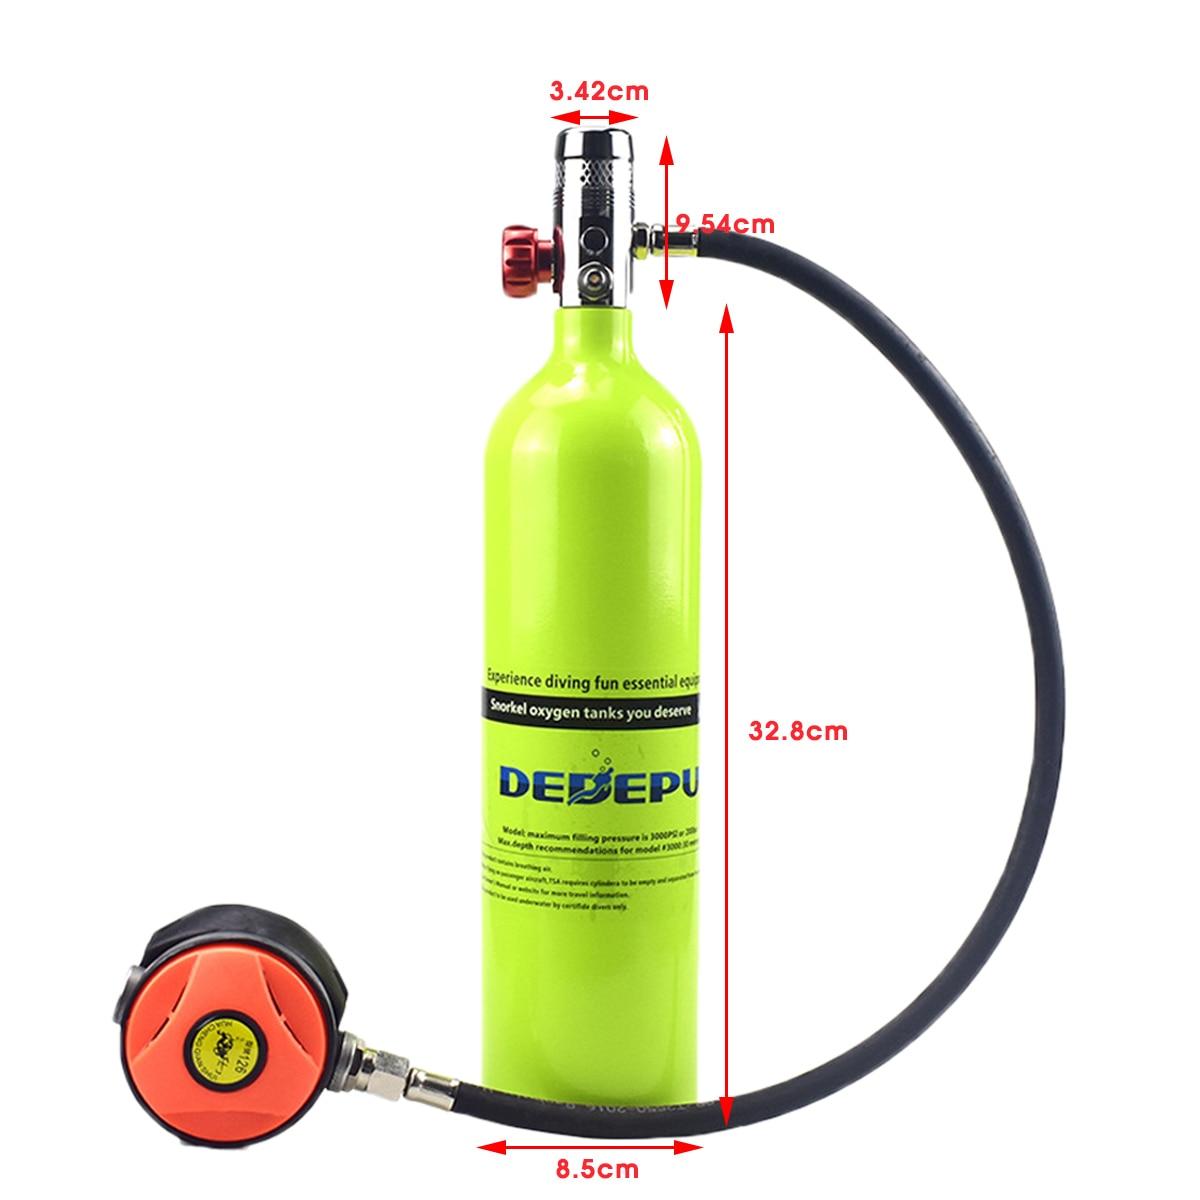 Equipo de Buceo 1L, cilindro de buceo, tanque de oxígeno, respirador, adaptador de repuesto, bomba de alta presión, accesorios de respiración de buceo - 4